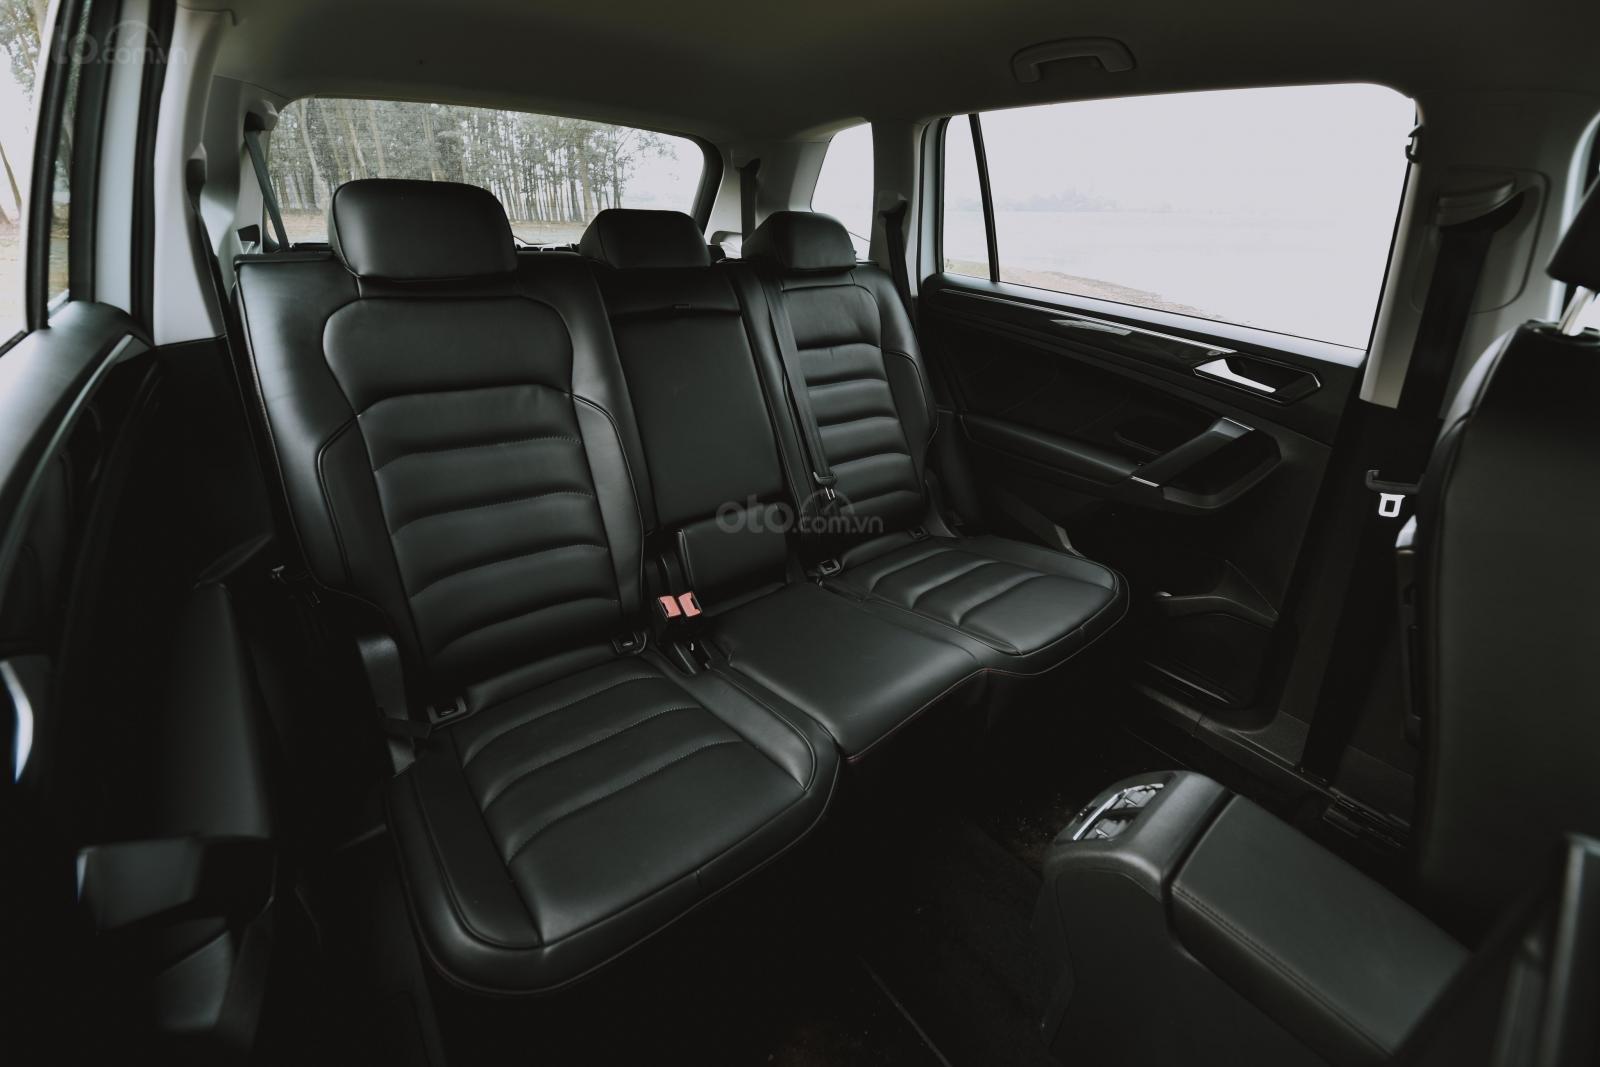 VW Tiguan Allspace Luxury 2019 - Đủ màu giao ngay. Hotline: 090-898-8862-8